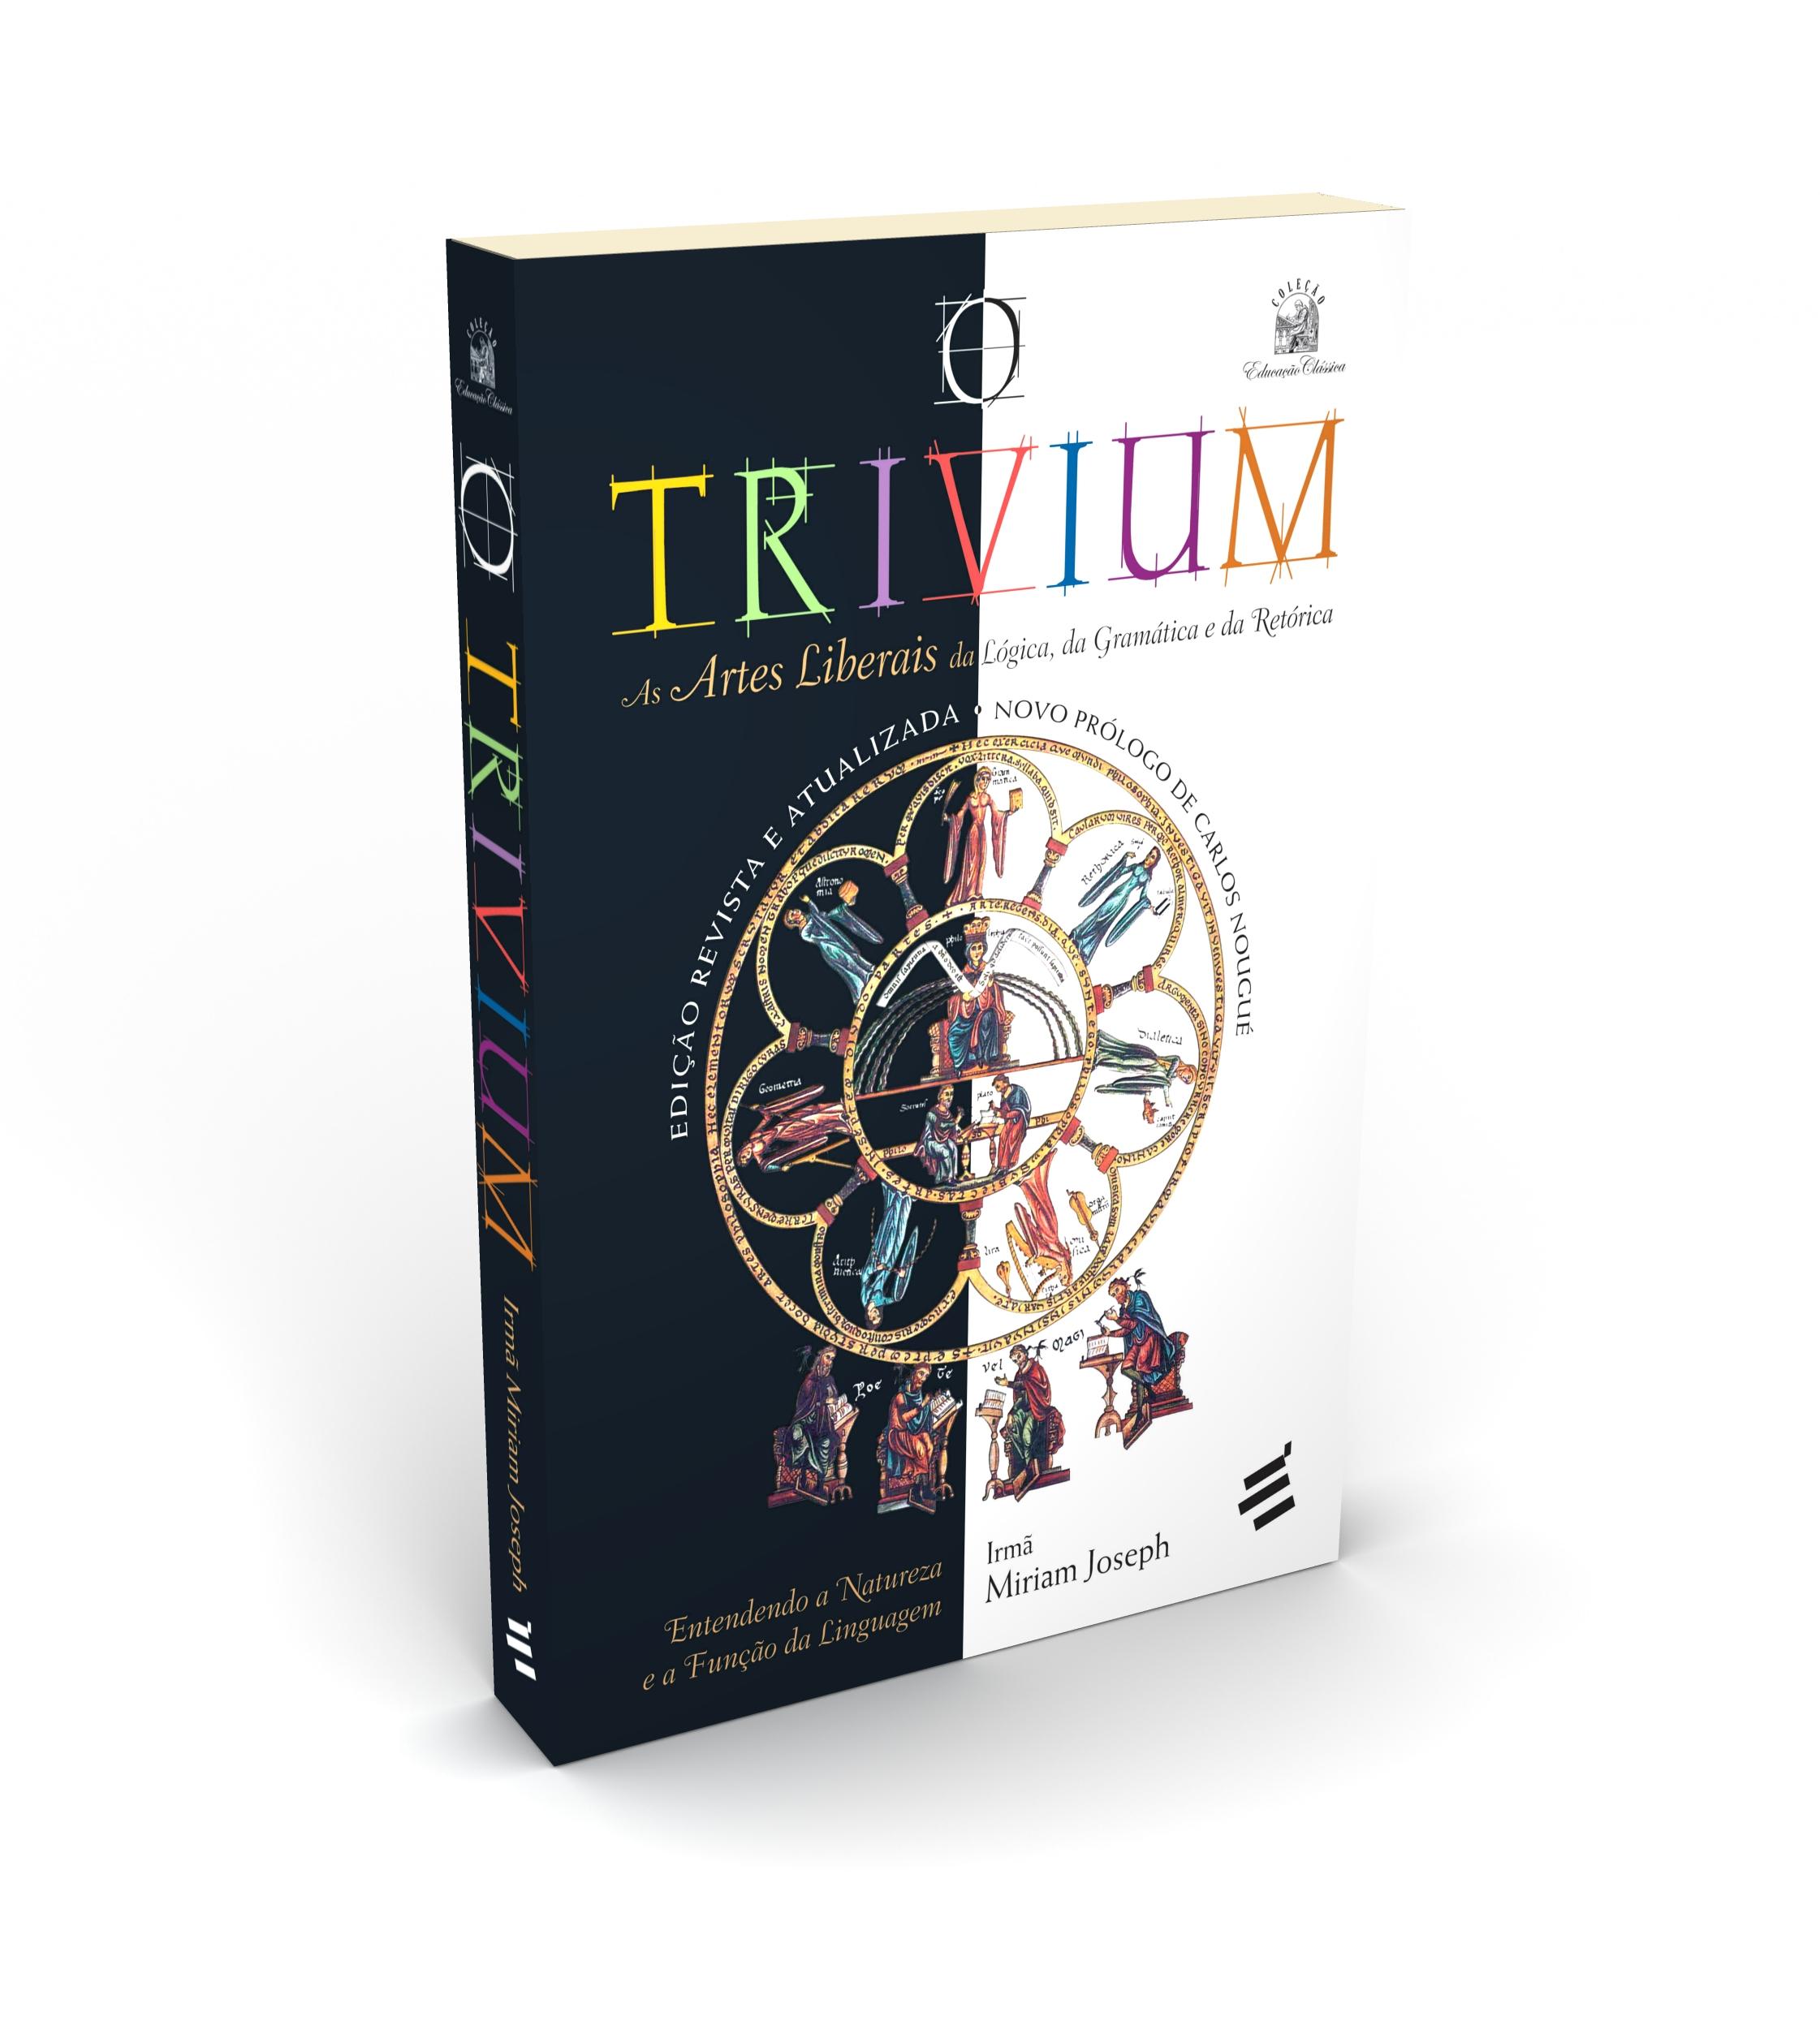 Festa do Livro da USP Trivium